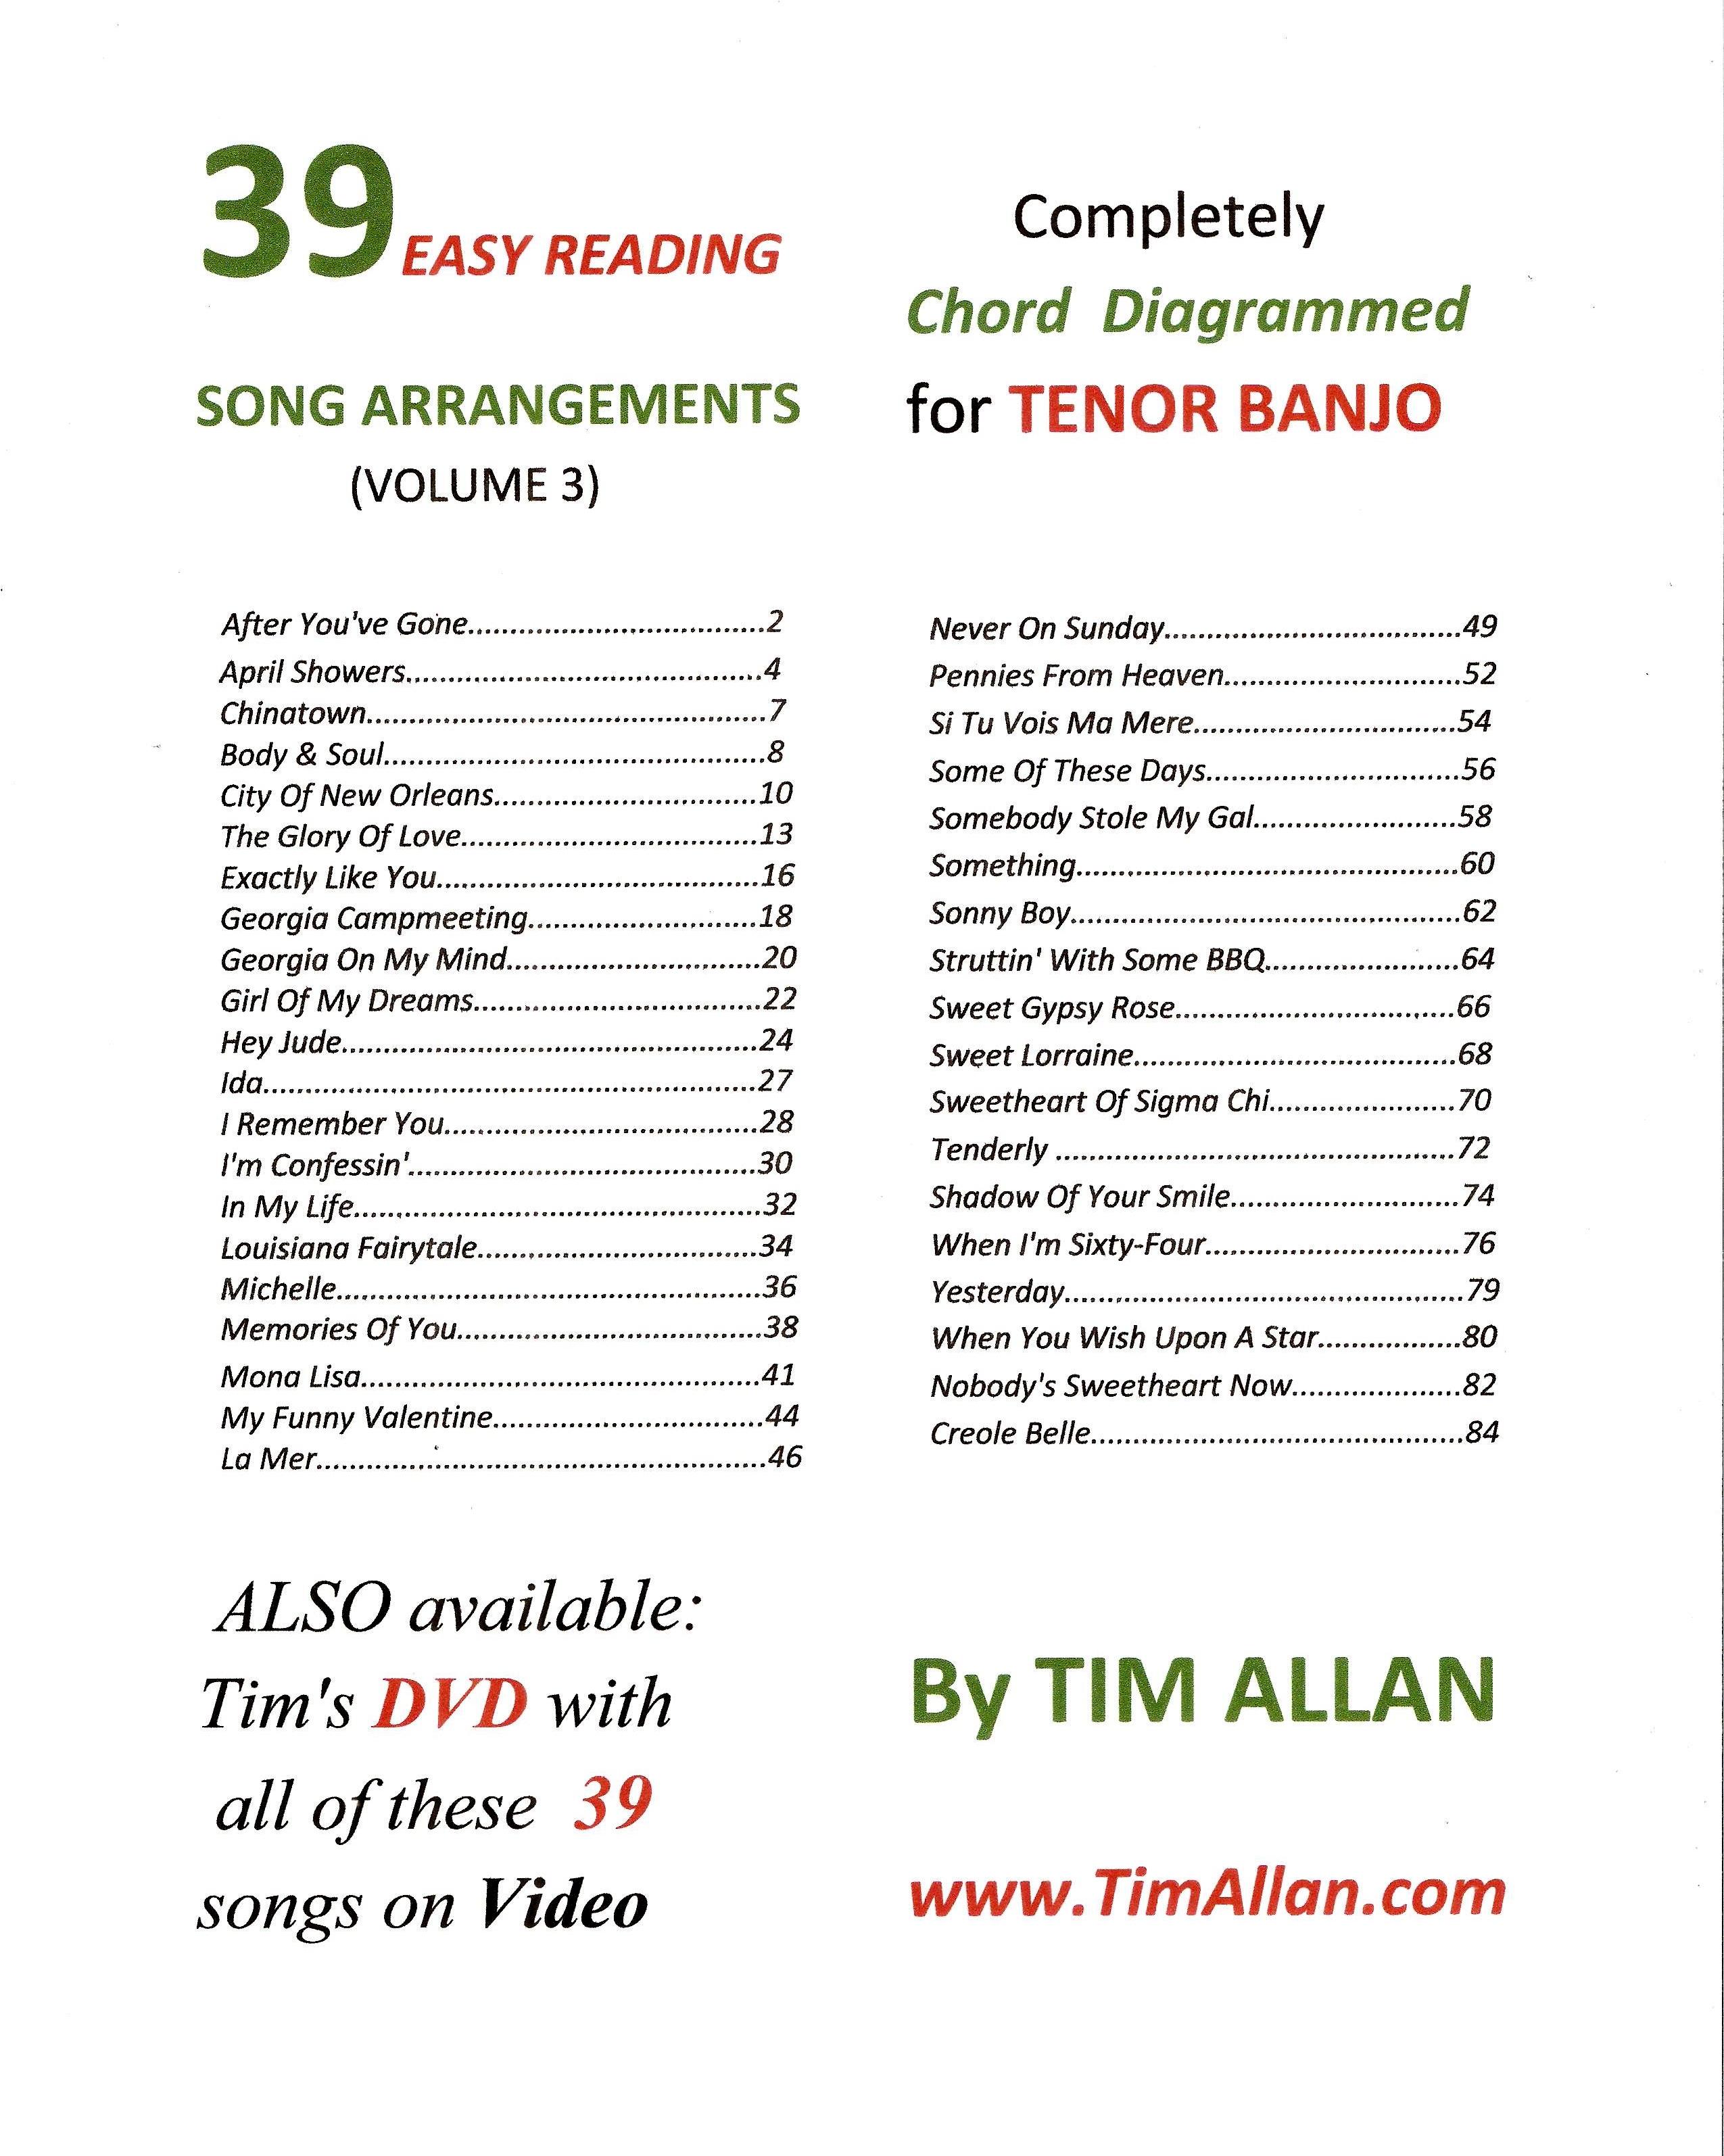 39 Easy Reading Song Arrangements Volume 3 Tim Allan